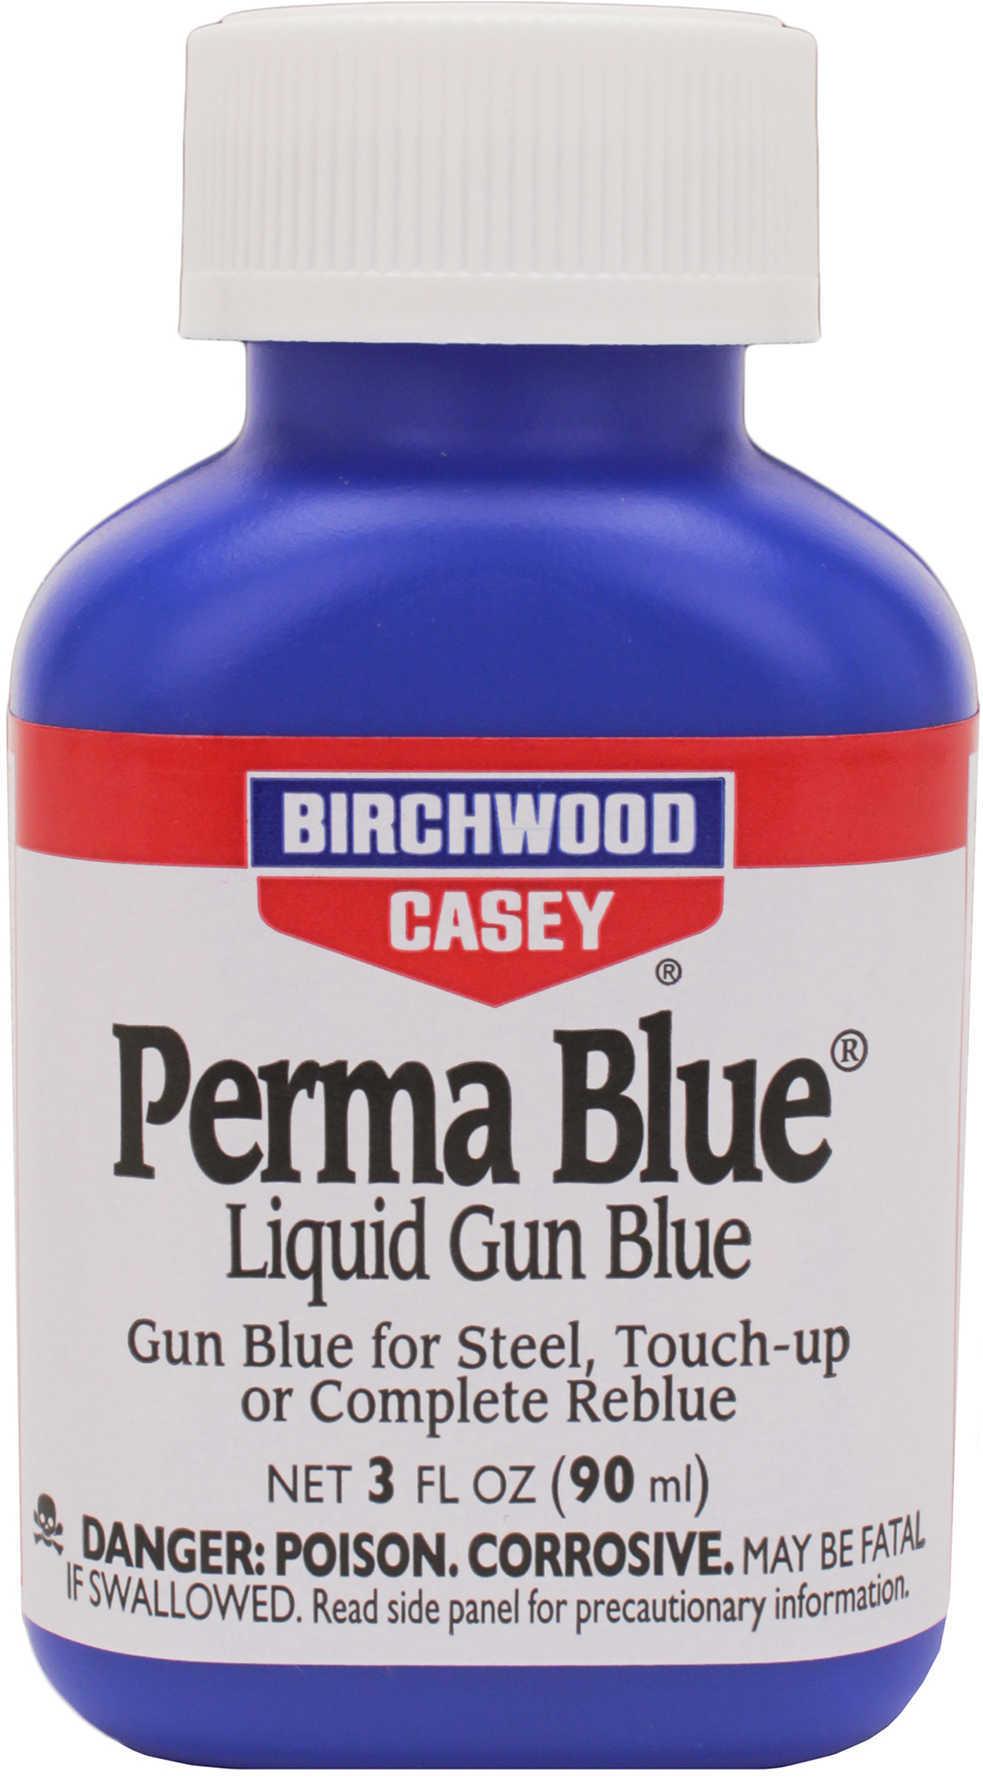 Birchwood Casey 13125 Perma Blue Liquid Gun Blue Perma Blue Liquid Gun Blue 3 oz